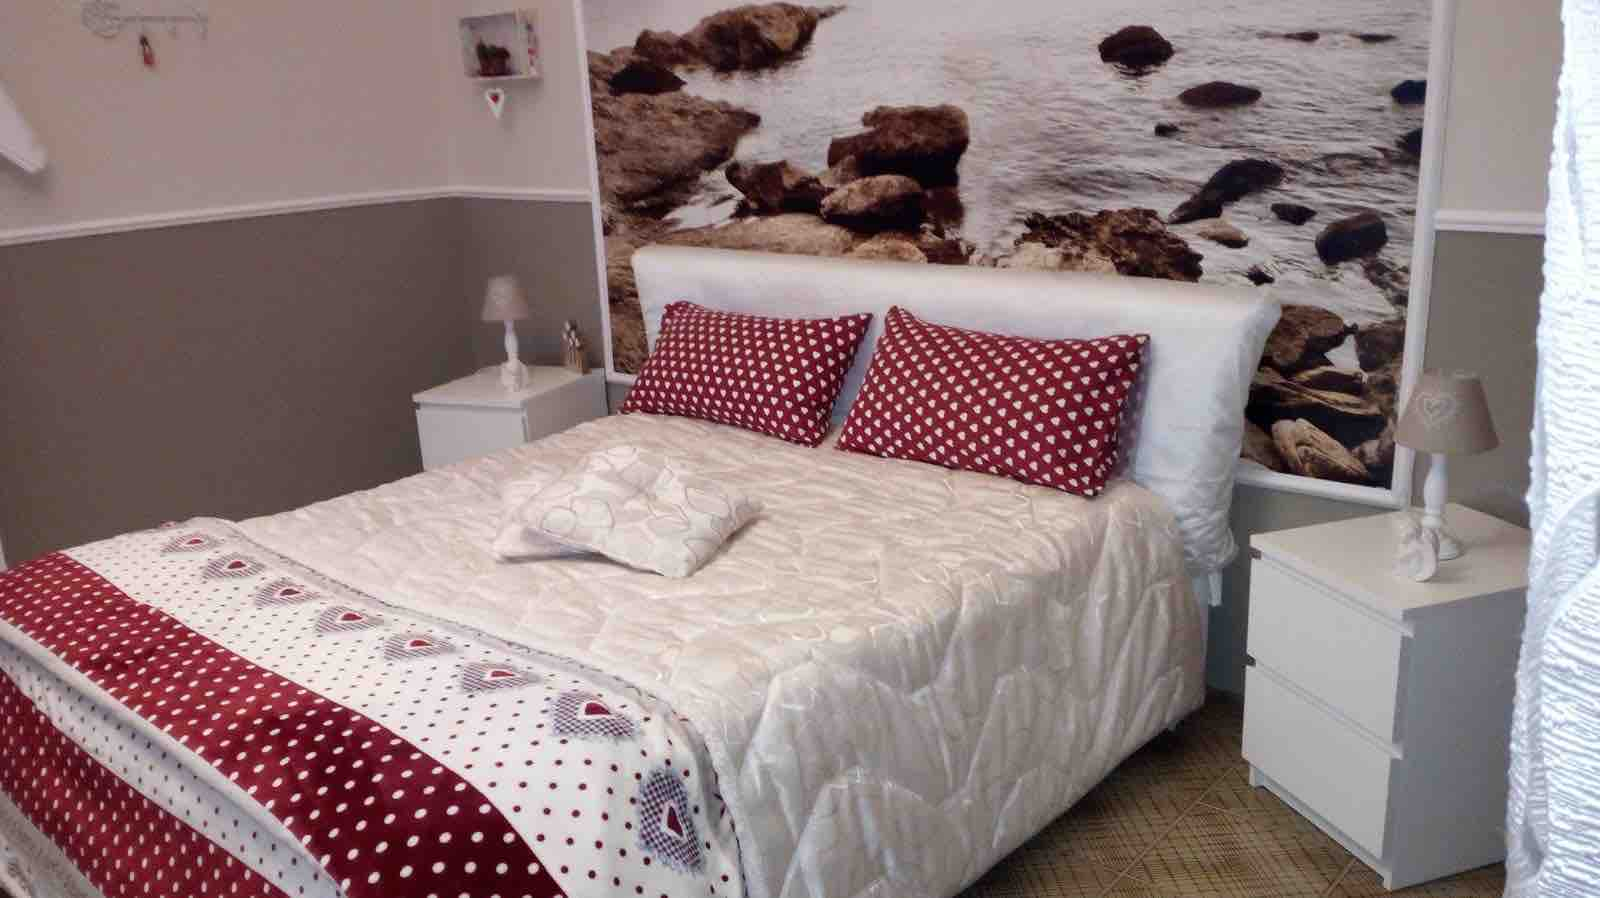 Camere Da Letto Taranto b&b the magic place camera ocean - apartments for rent in